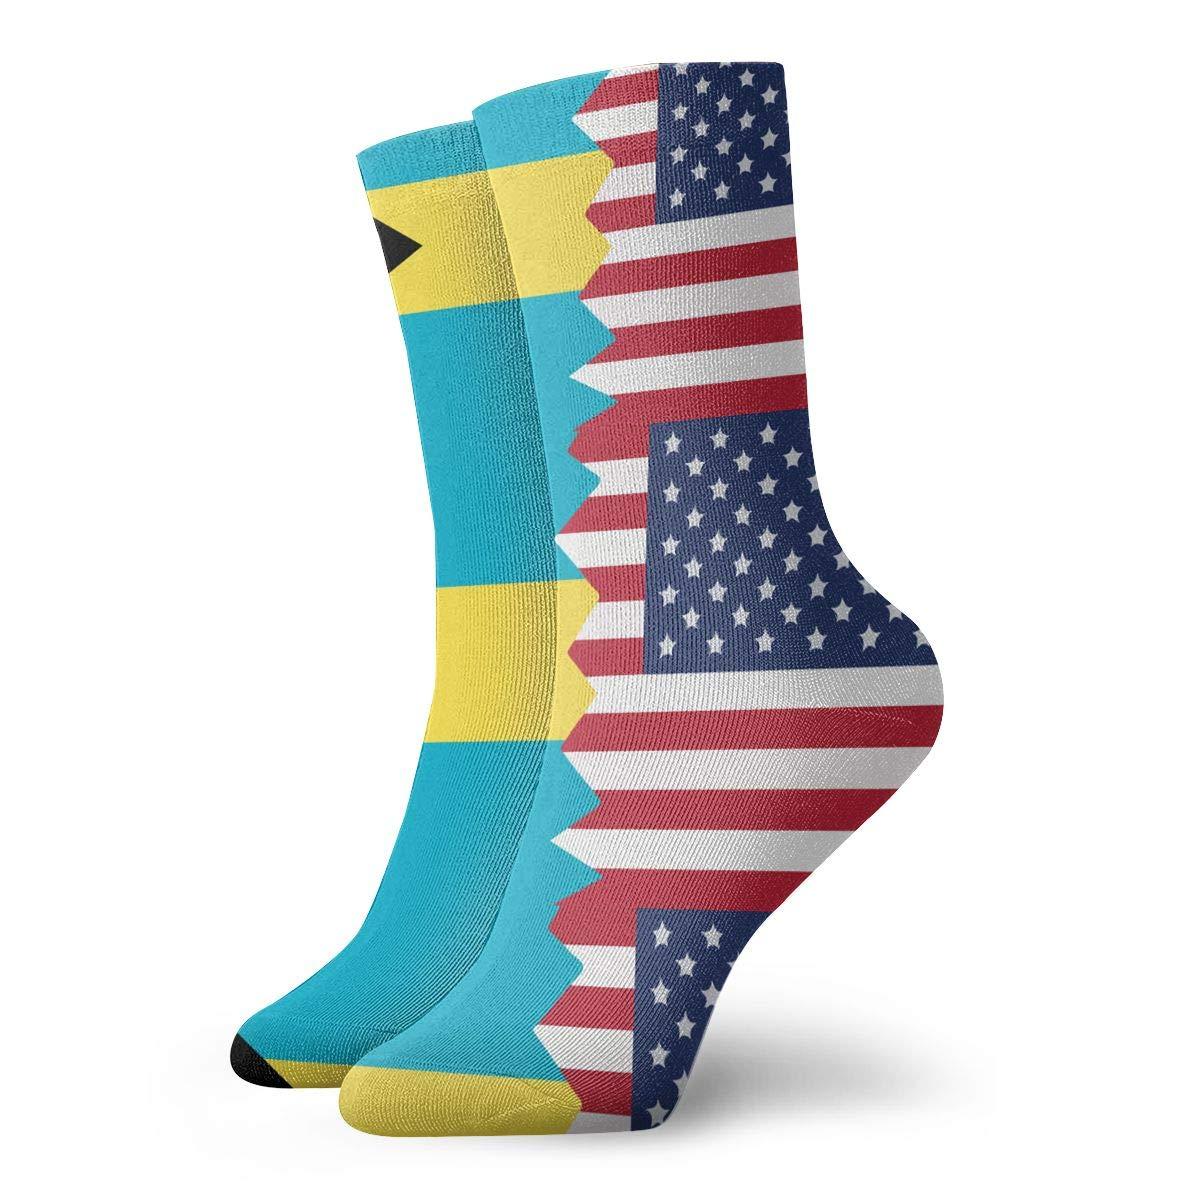 Adult Ferris Wheel Color Pattern Athletic Ankle Socks